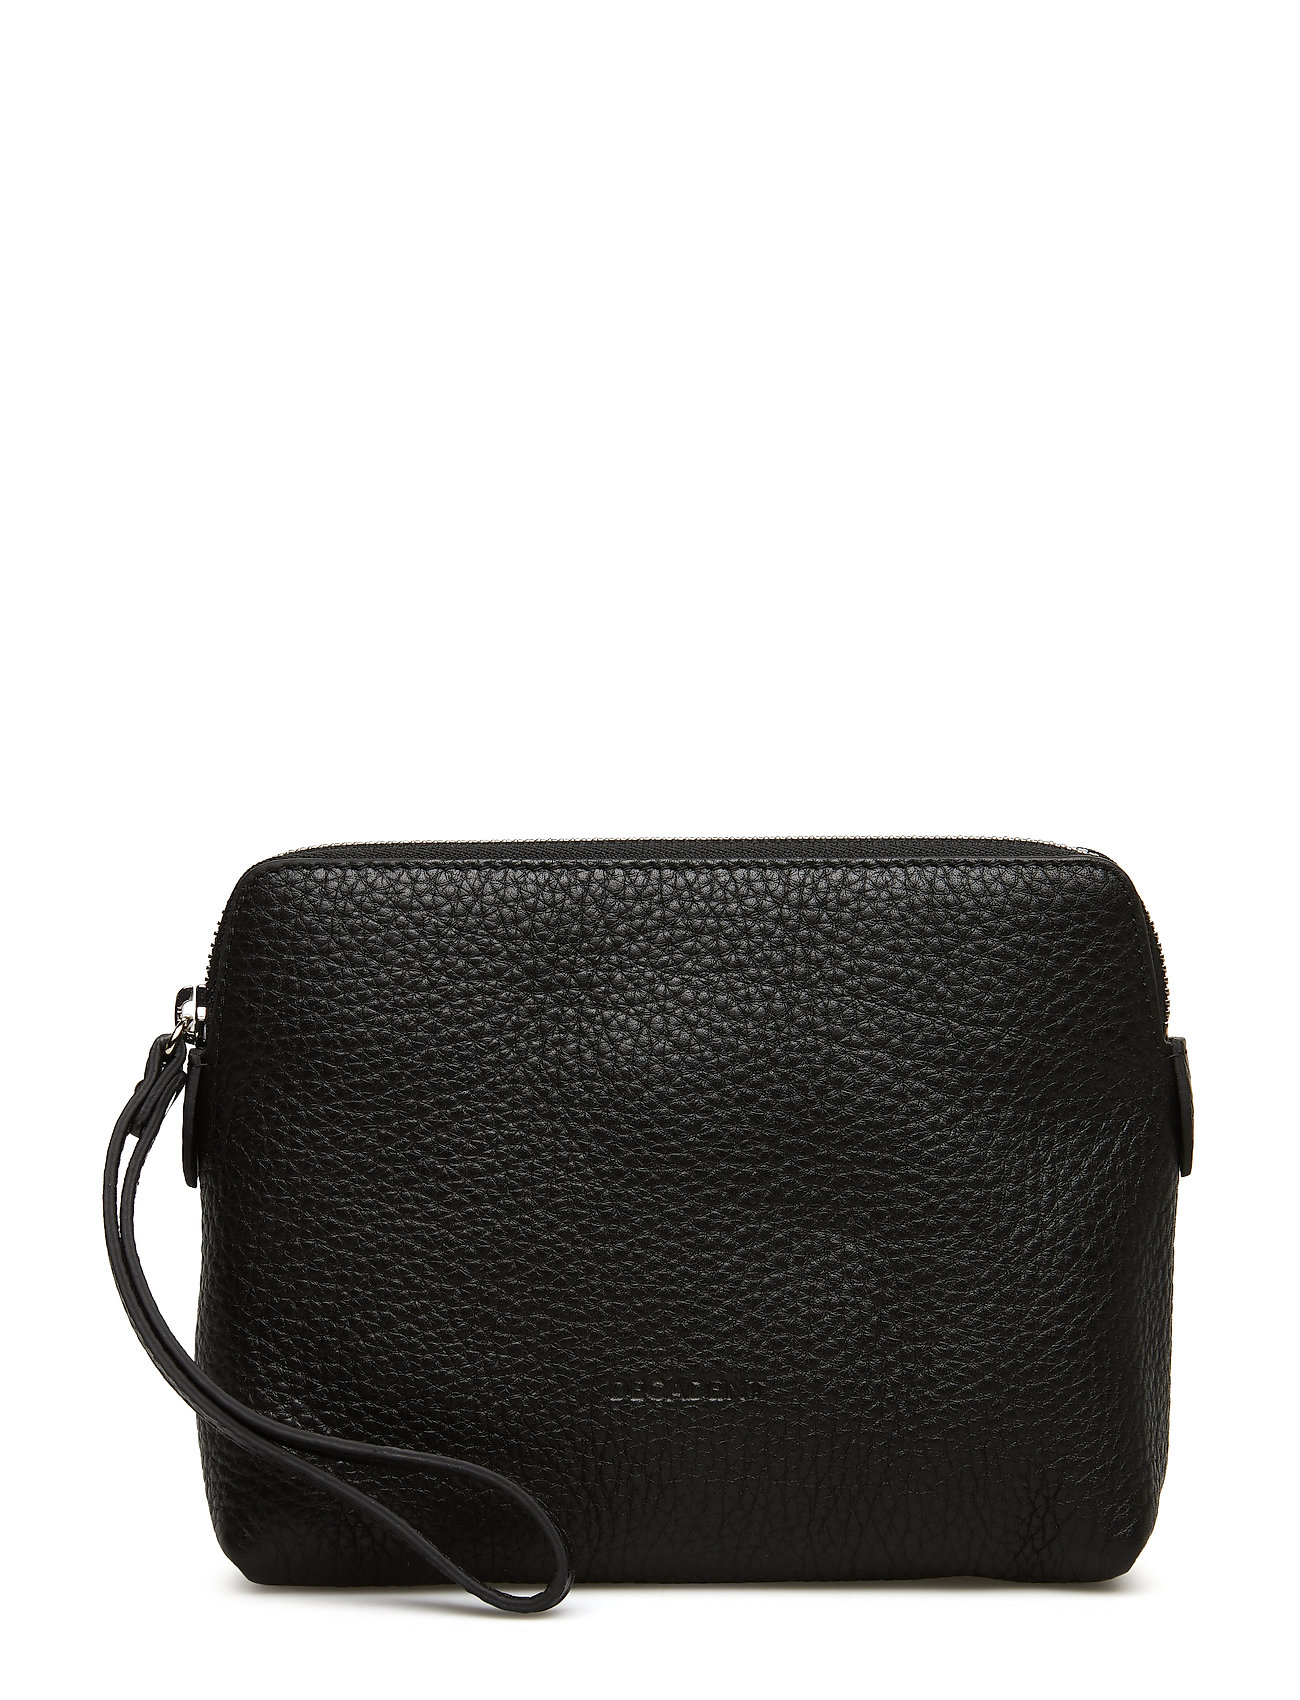 Decadent Hannah makeup purse